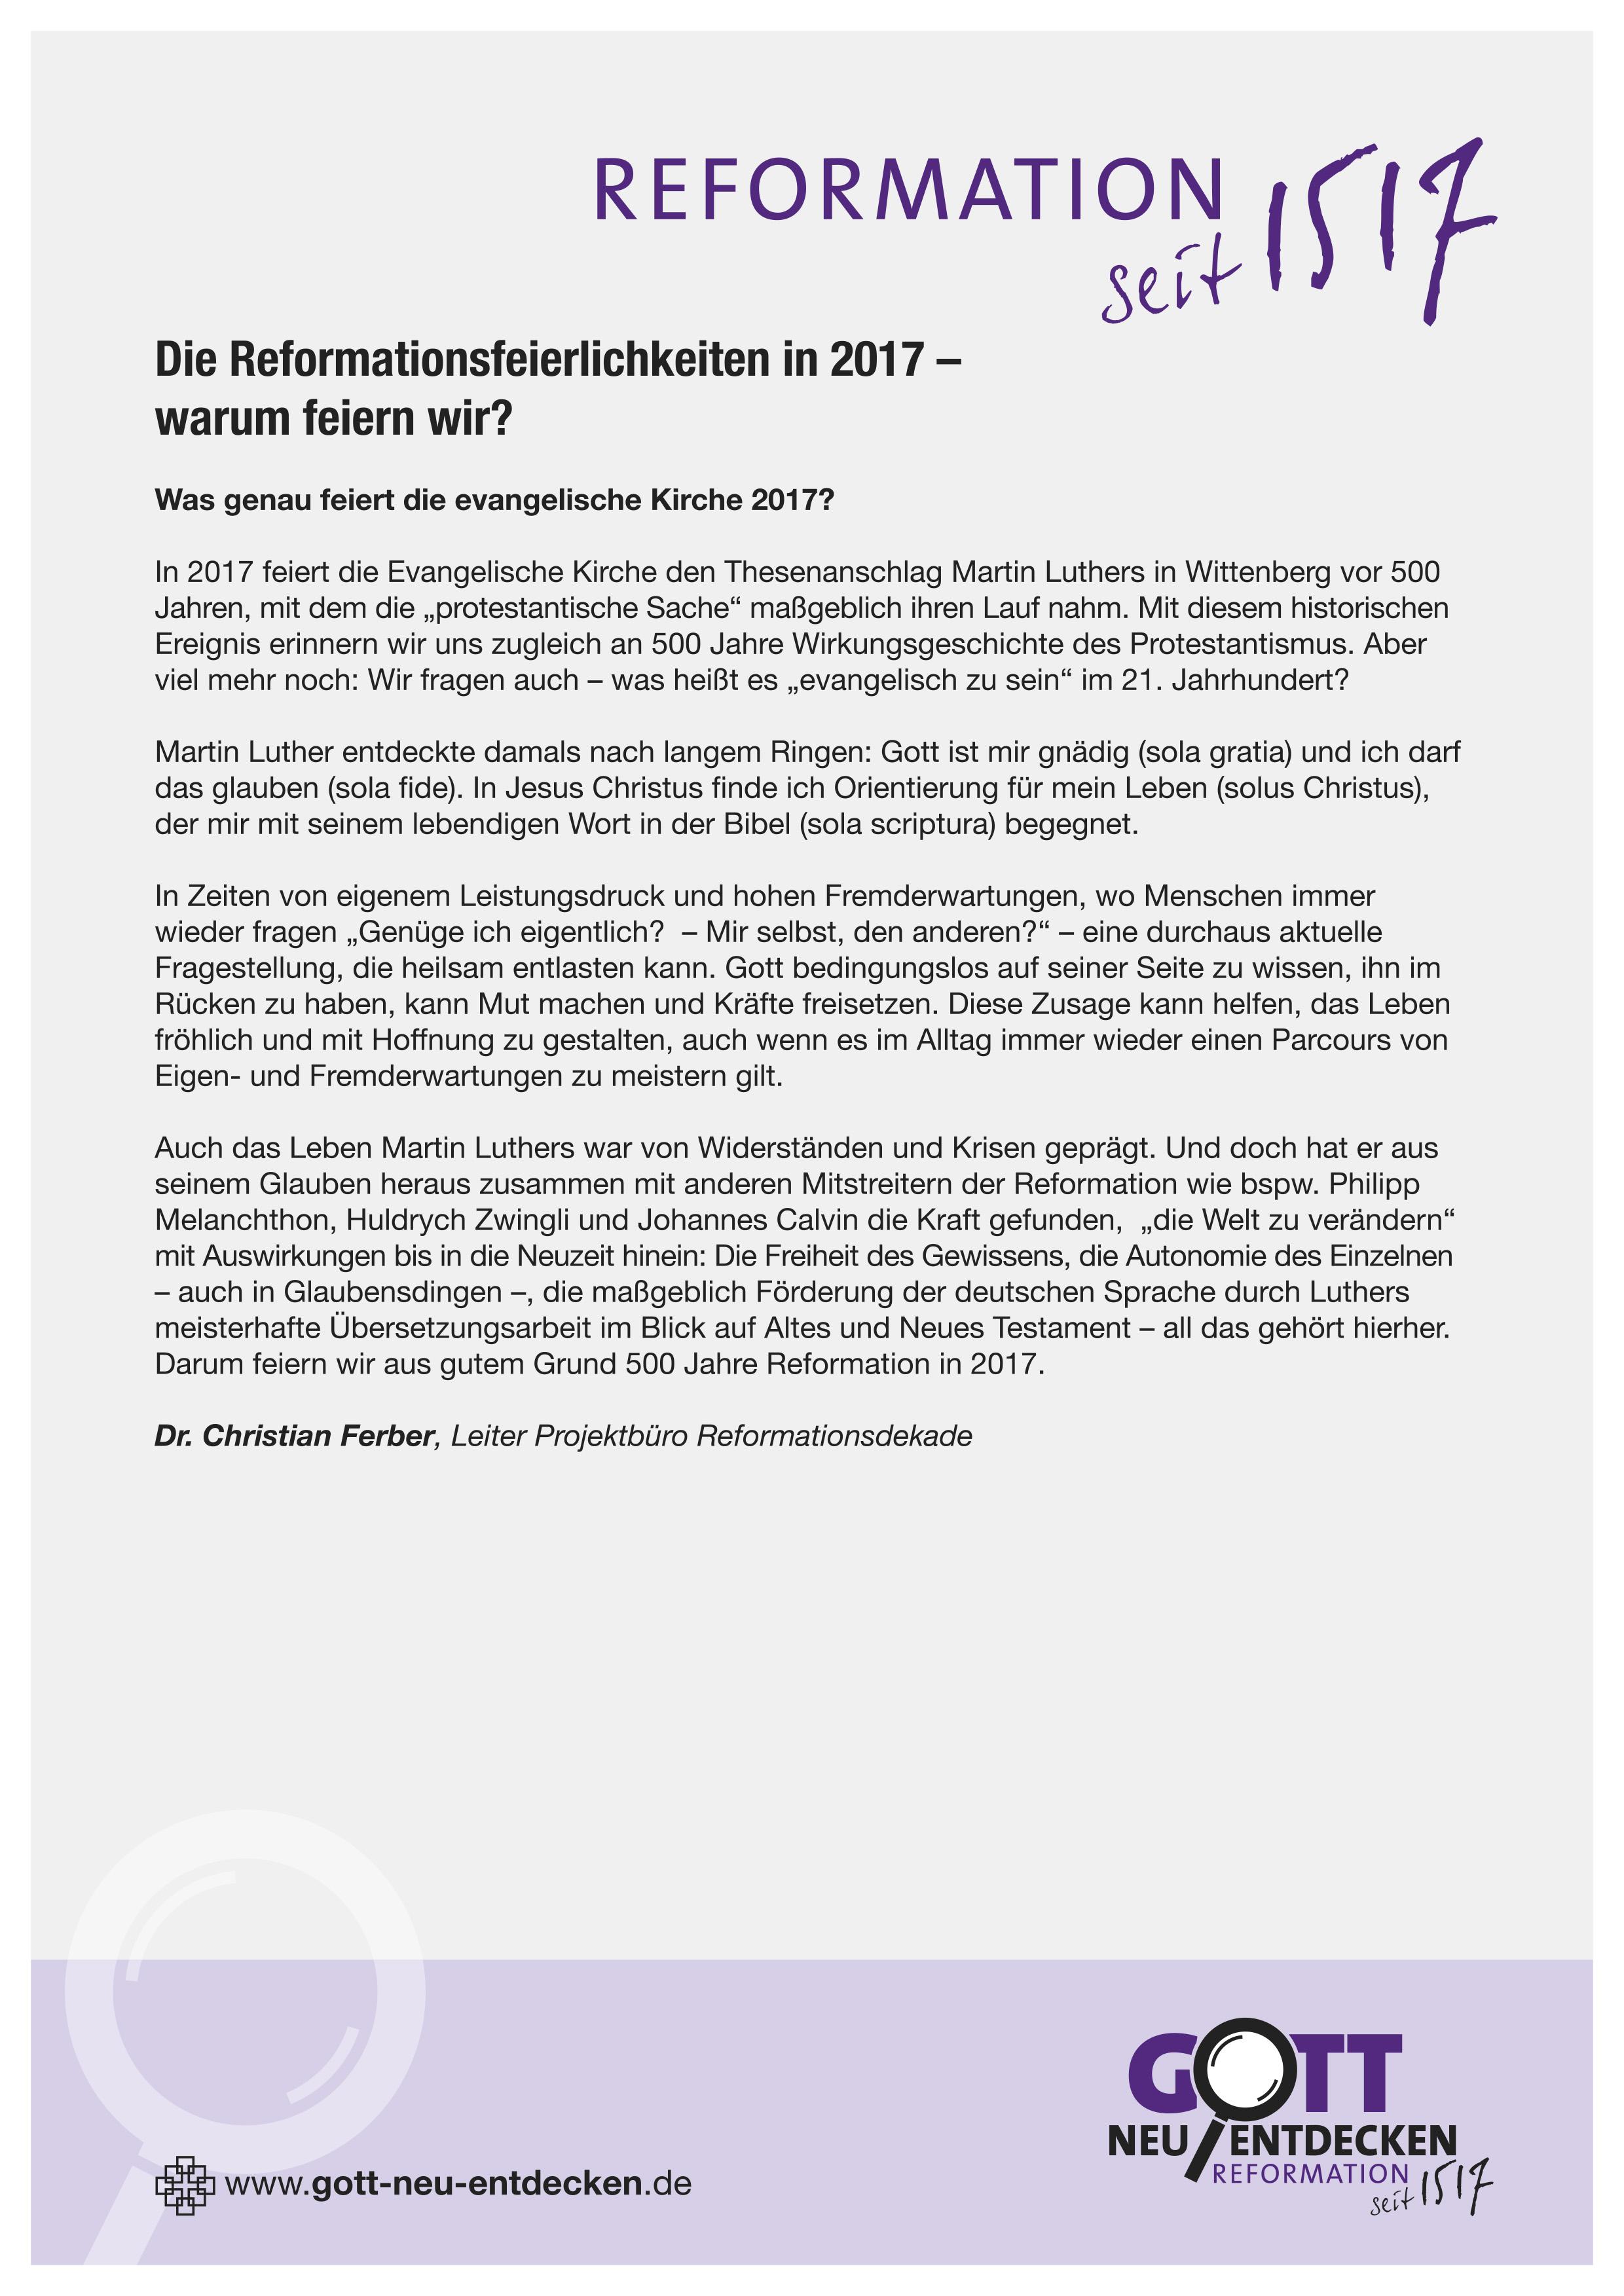 Großzügig Freies Wort Der Belegschablone Ideen - Entry Level Resume ...